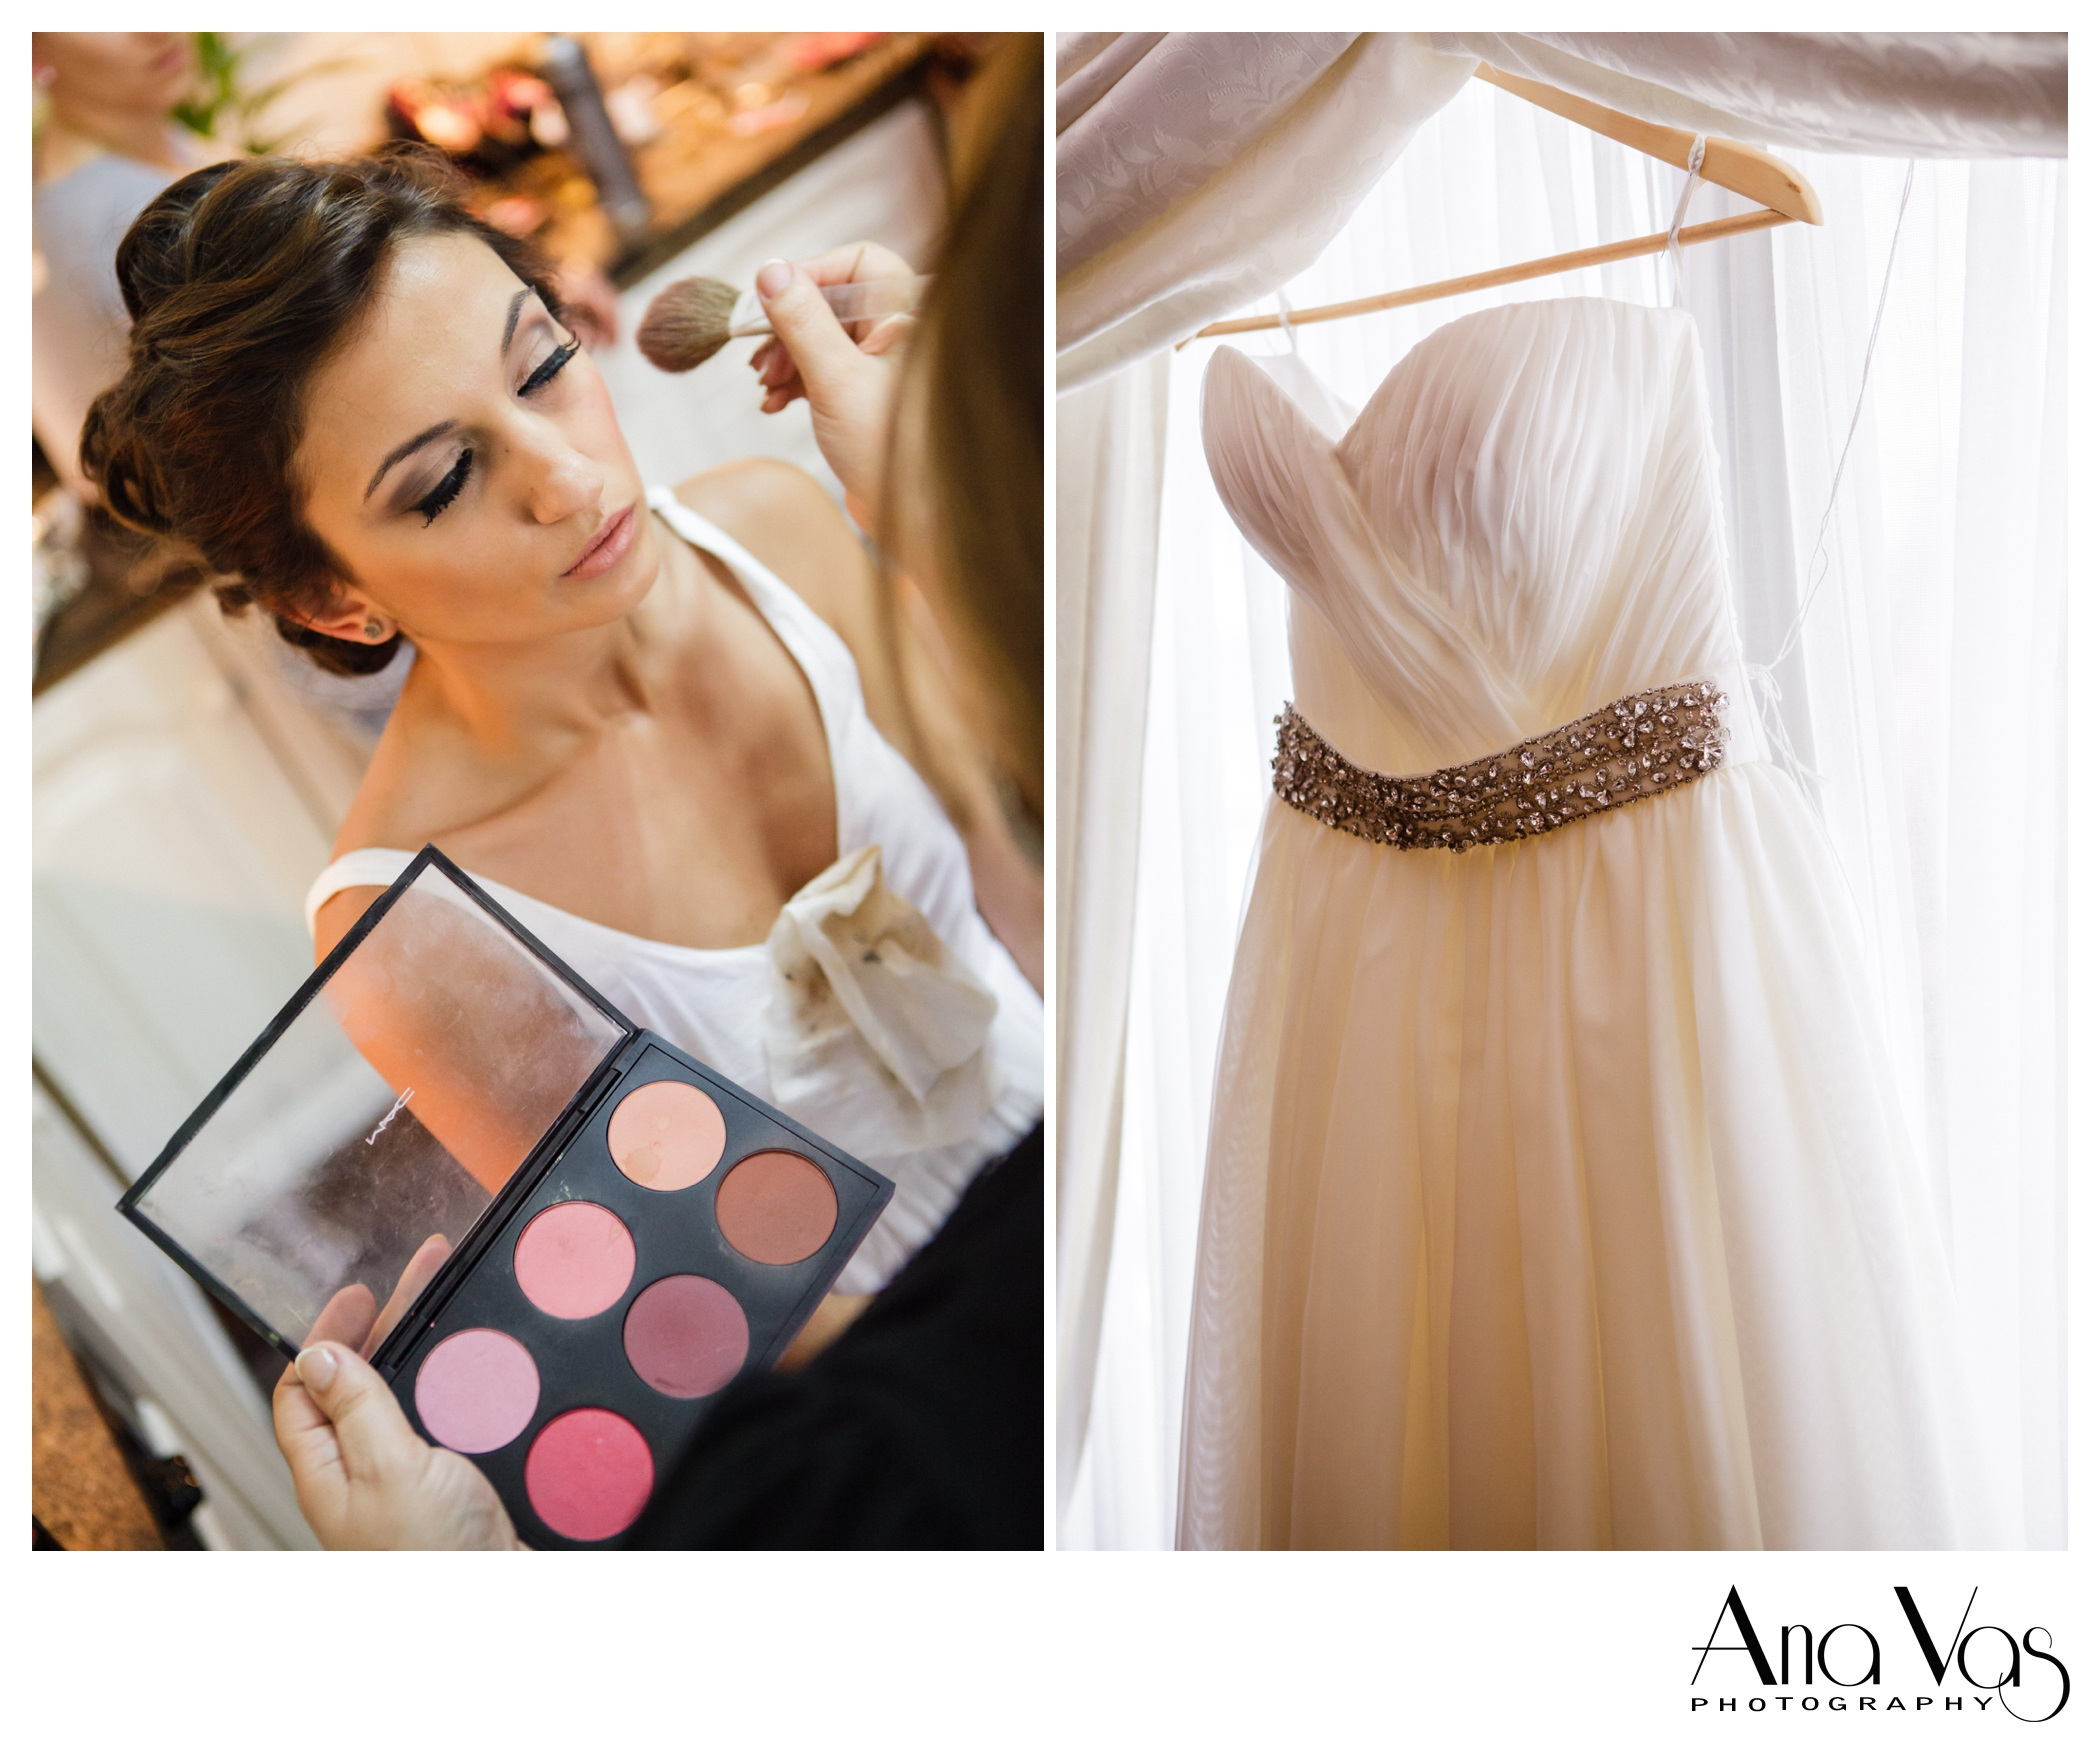 Wedding Dress and Make Up